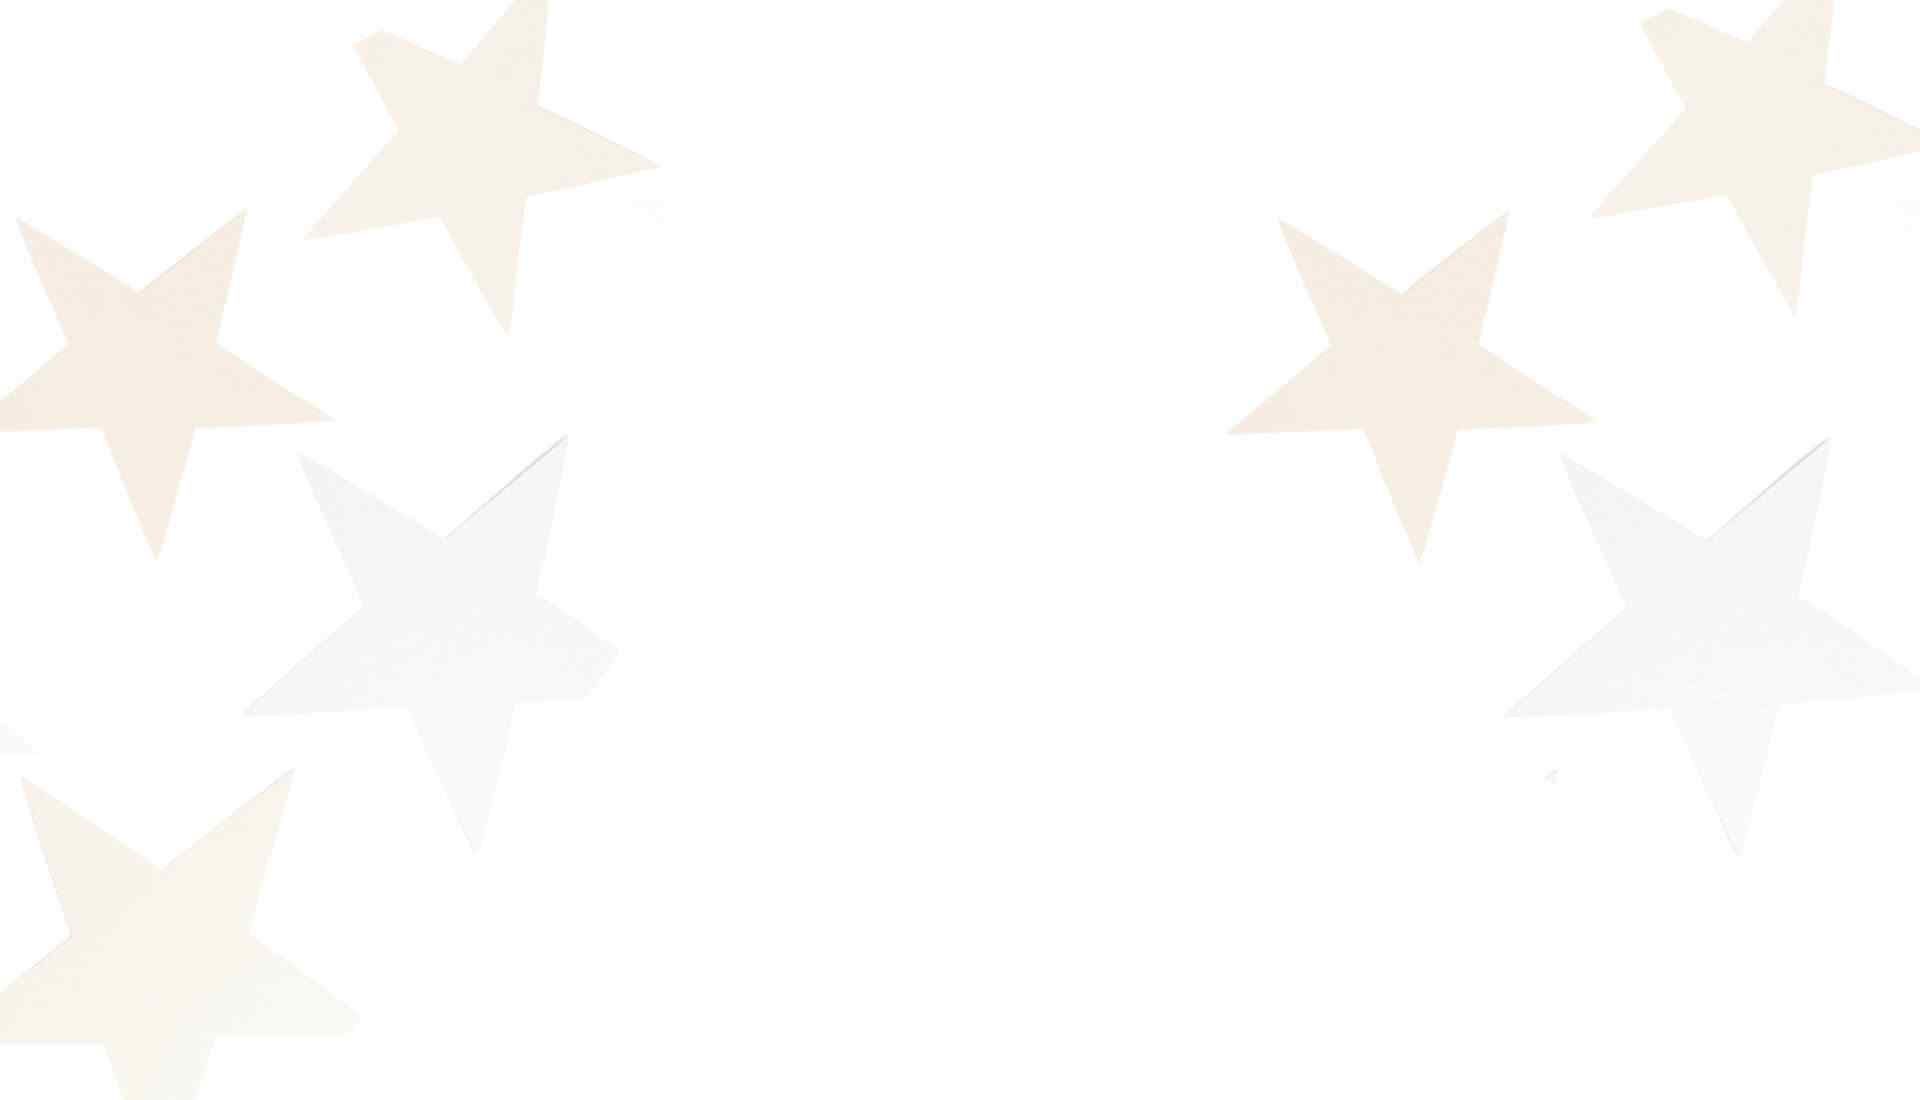 https://be-together.eu/wp-content/uploads/2019/05/footer_background_stars.jpg